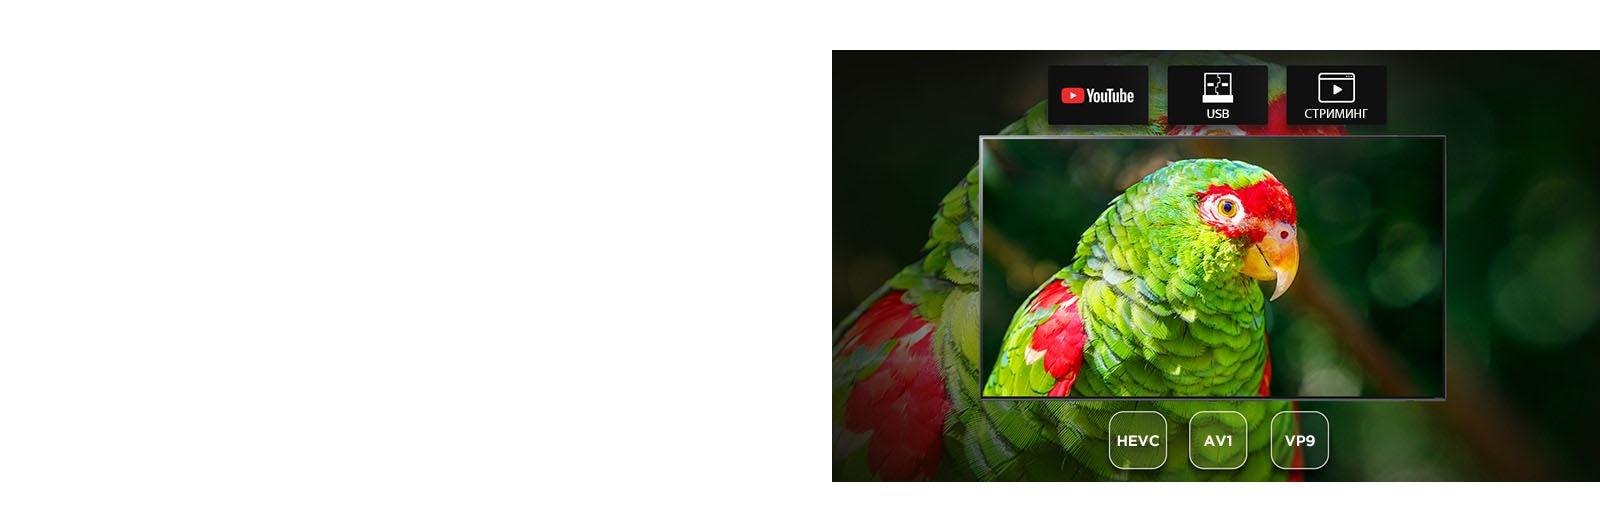 Экран телевизора с изображем попугая и иконкам Youtube, USB и Streaming